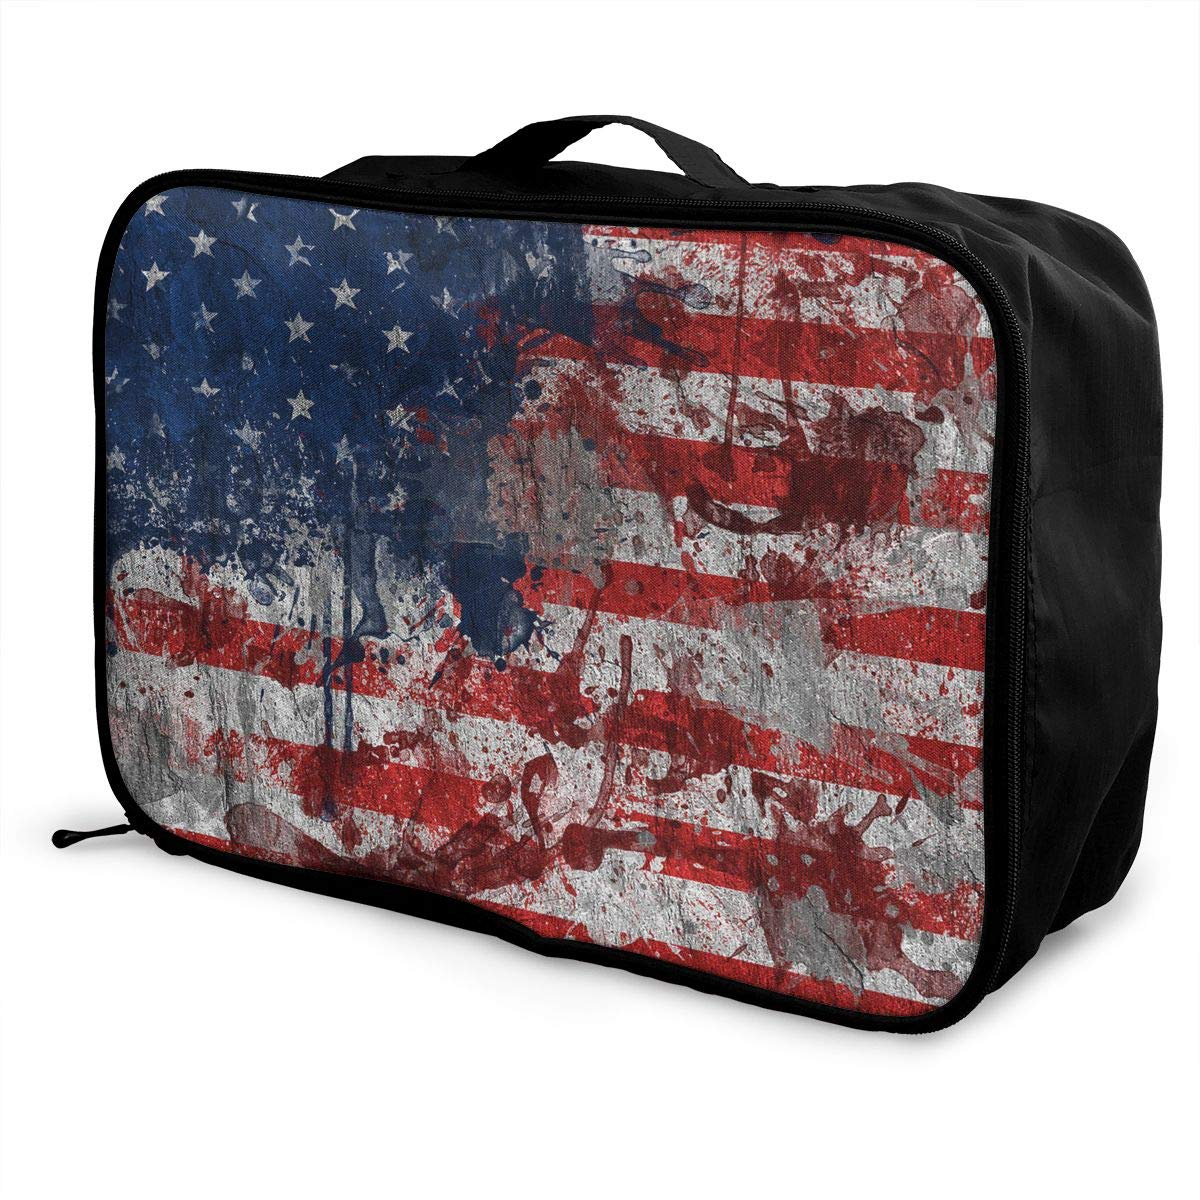 Travel Luggage Duffle Bag Lightweight Portable Handbag Flag Of The United States Large Capacity Waterproof Foldable Storage Tote